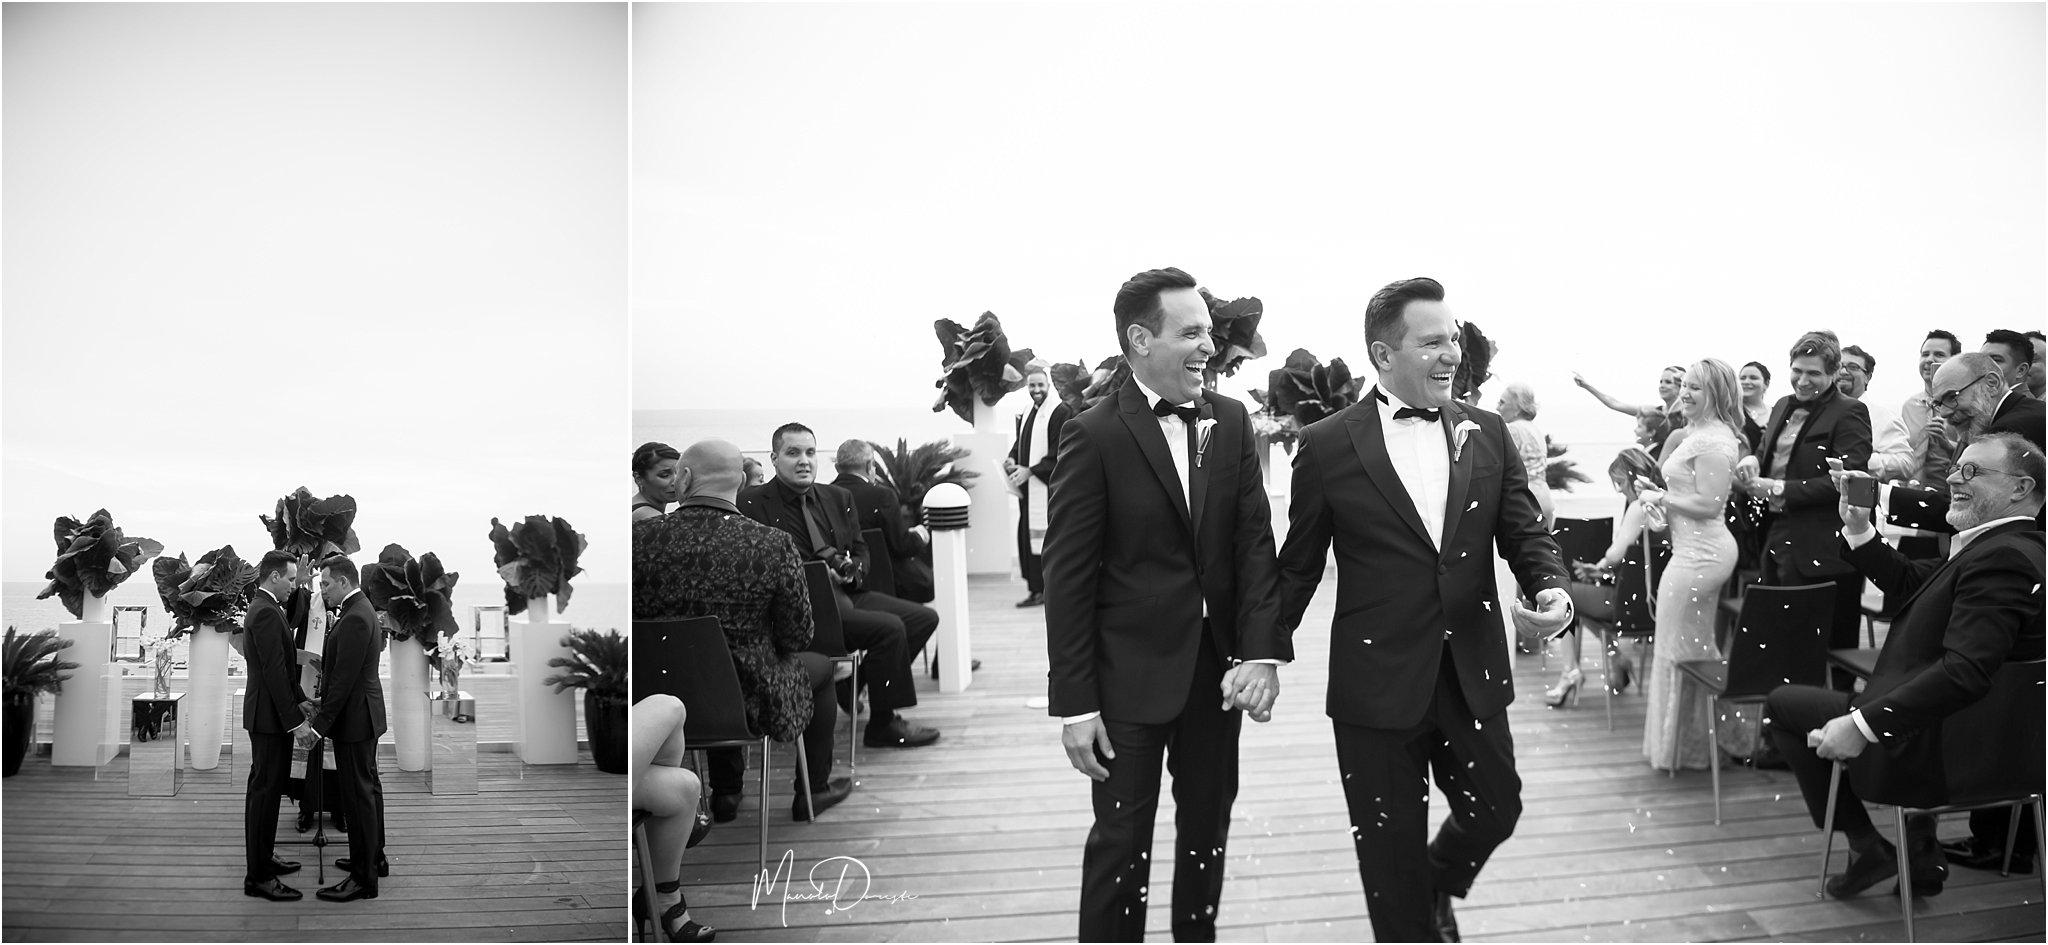 0194_ManoloDoreste_InFocusStudios_Wedding_Family_Photography_Miami_MiamiPhotographer.jpg